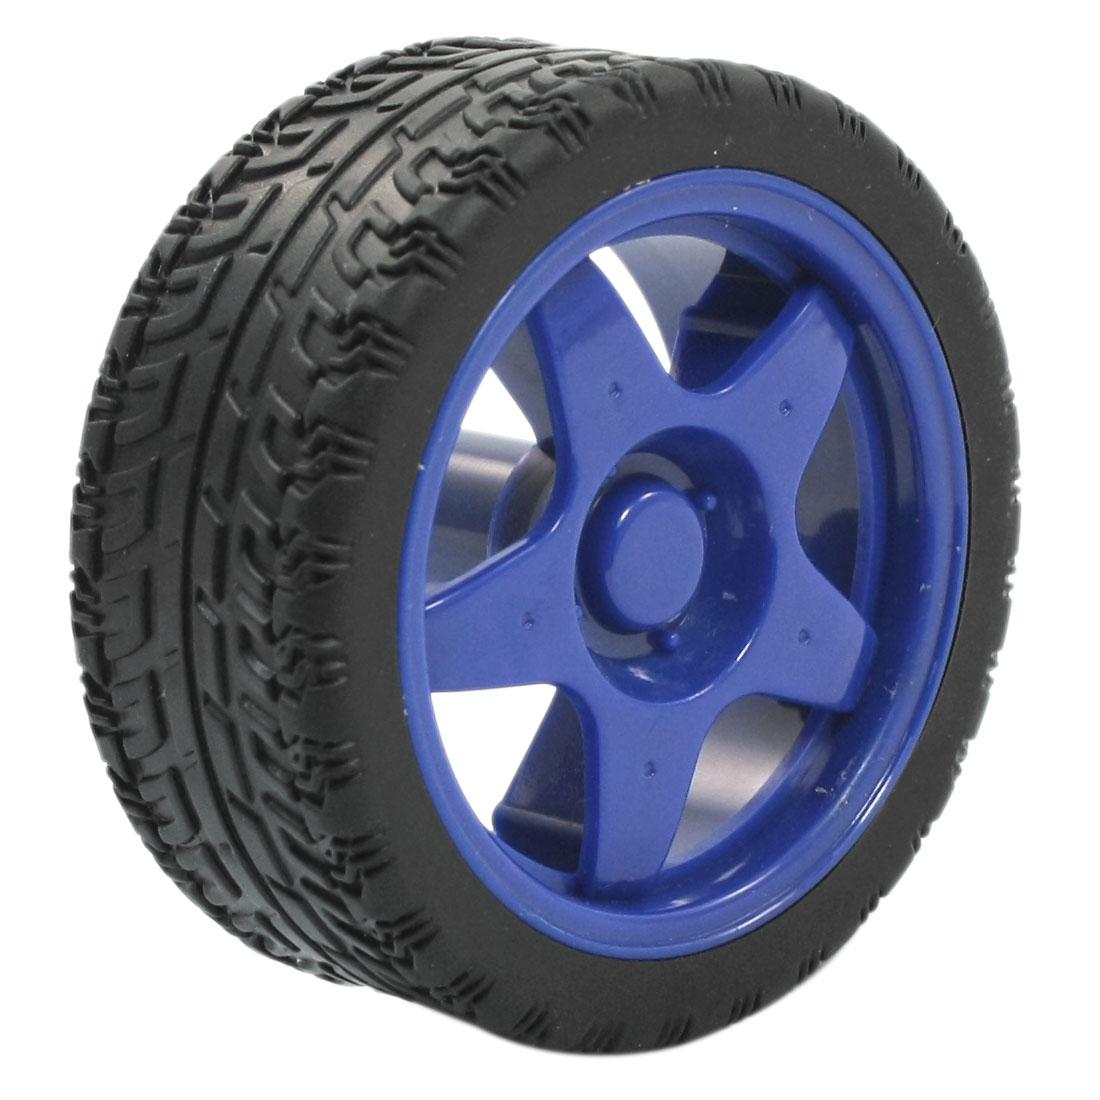 RC Smart Cars Truck DIY Spare Parts Blue Star 1:10 Drift Wheel Tire